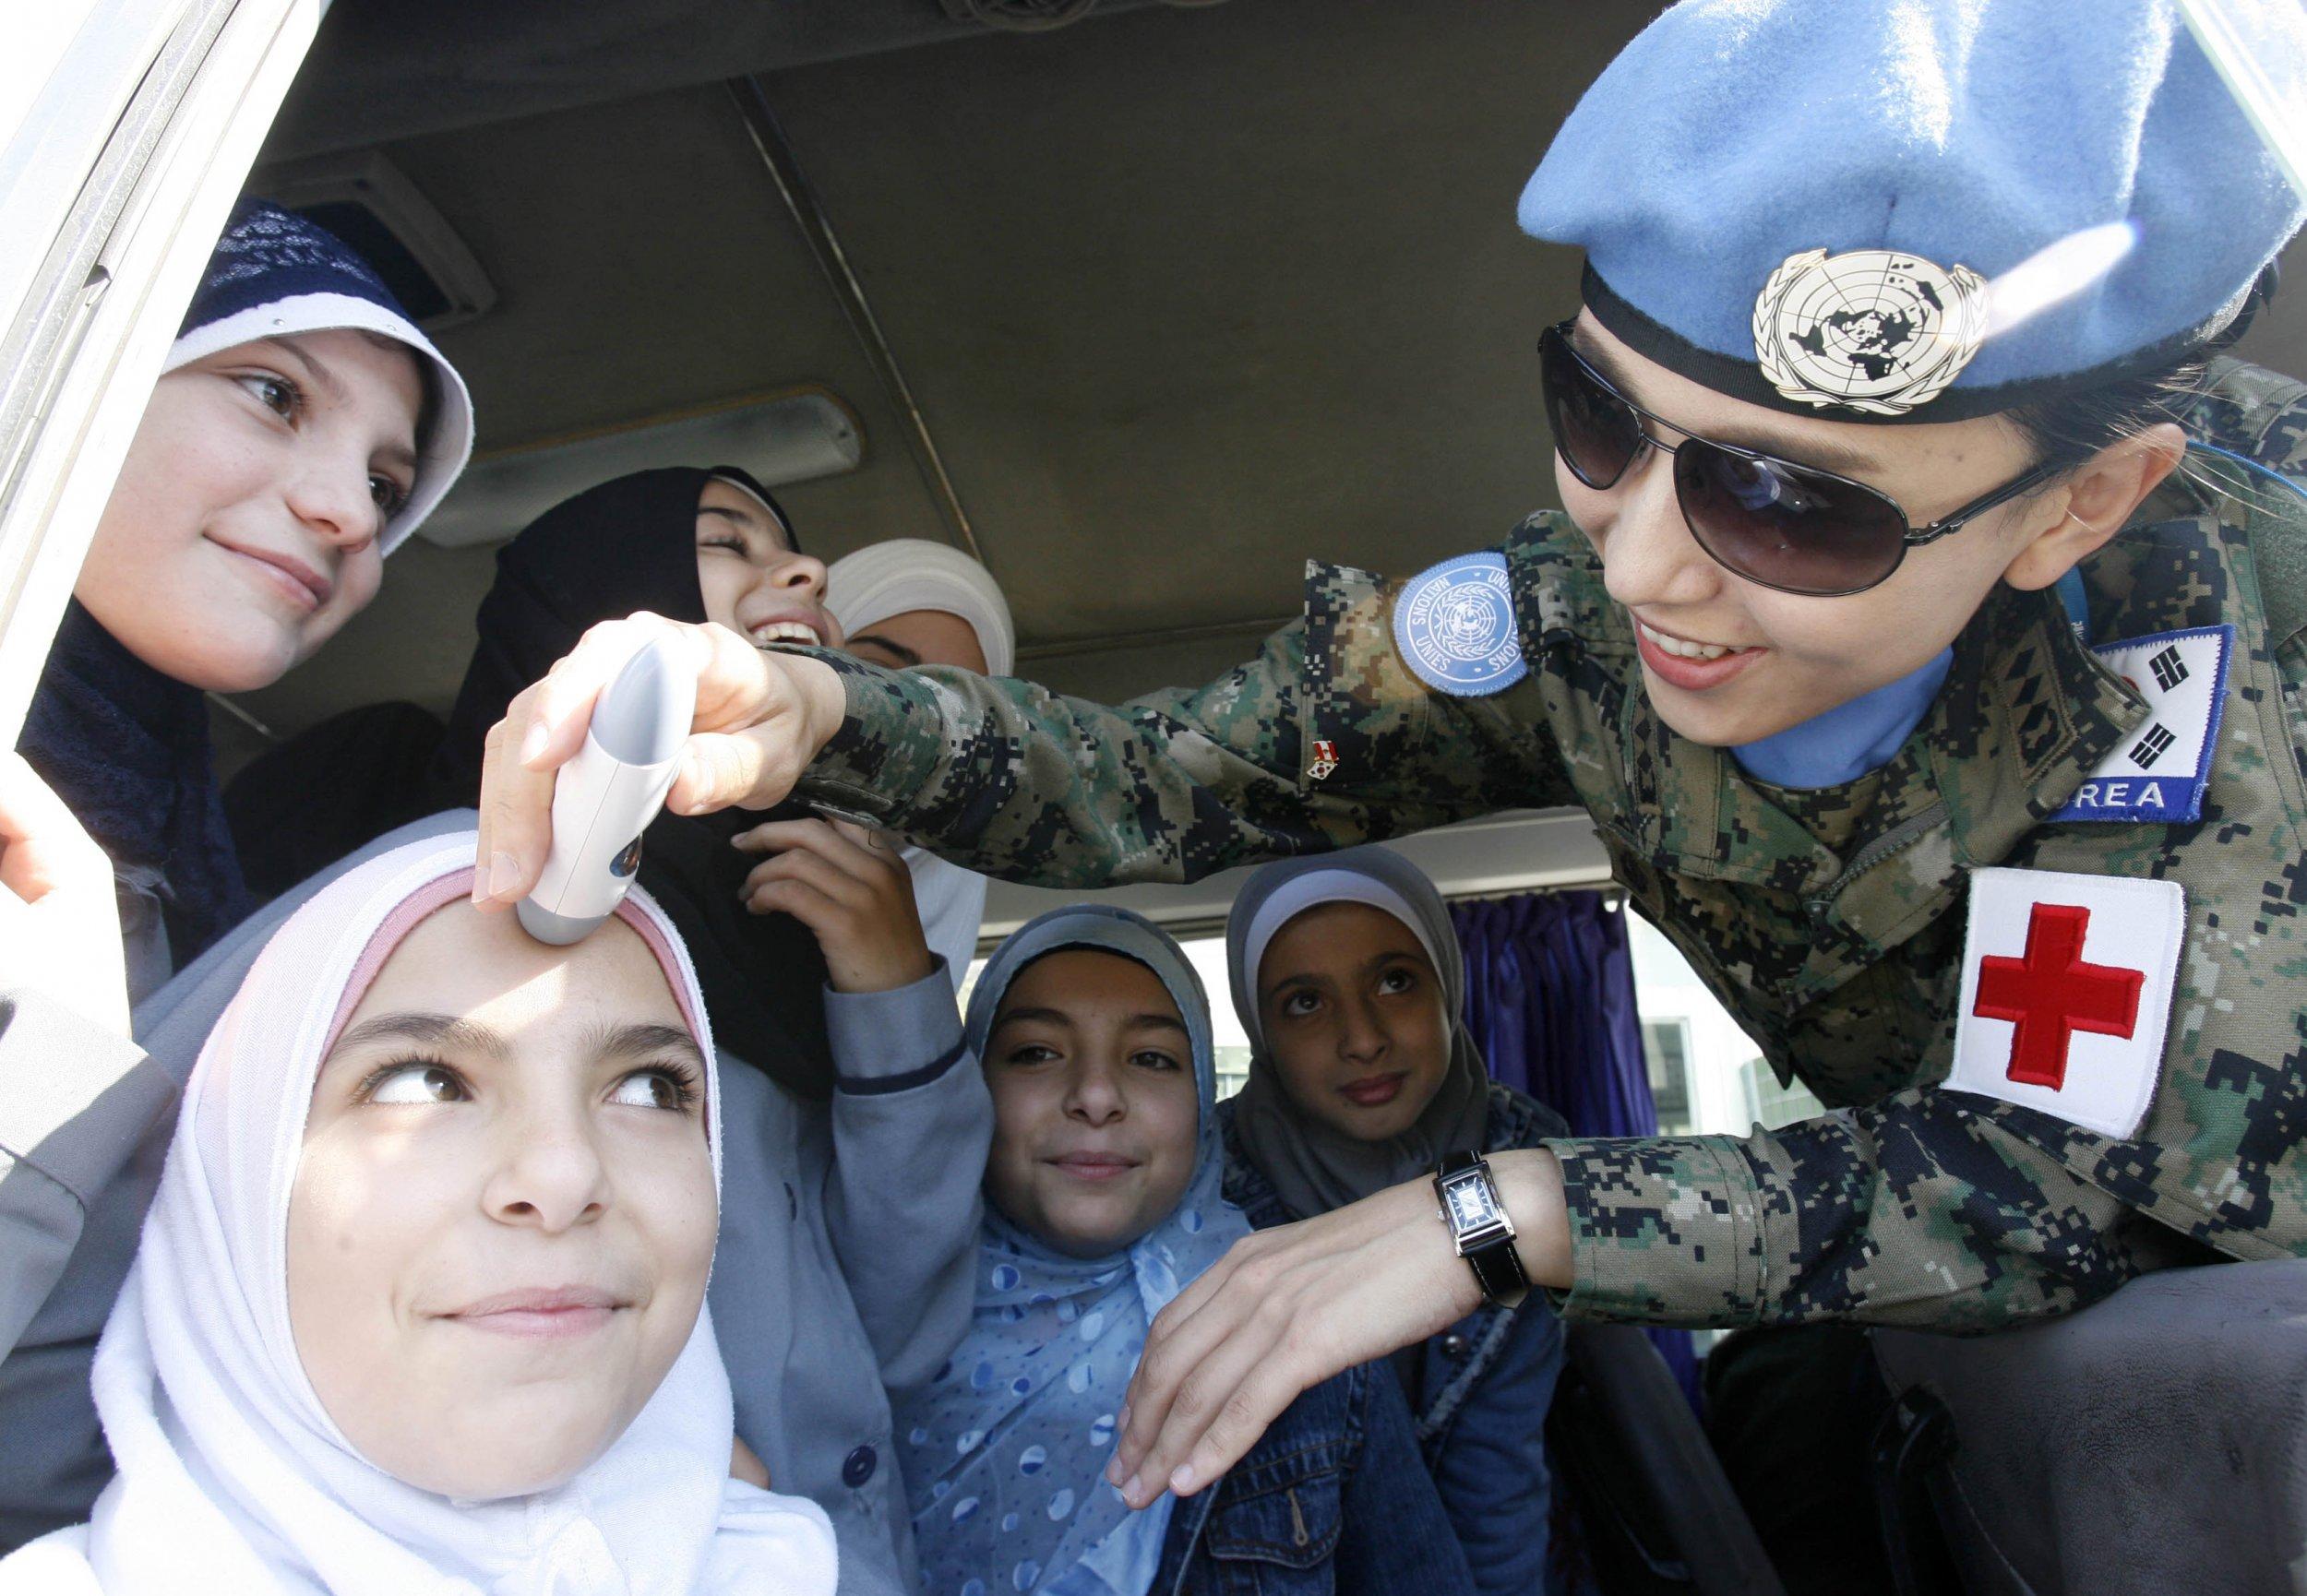 03_27_UN_Peacekeeper_01